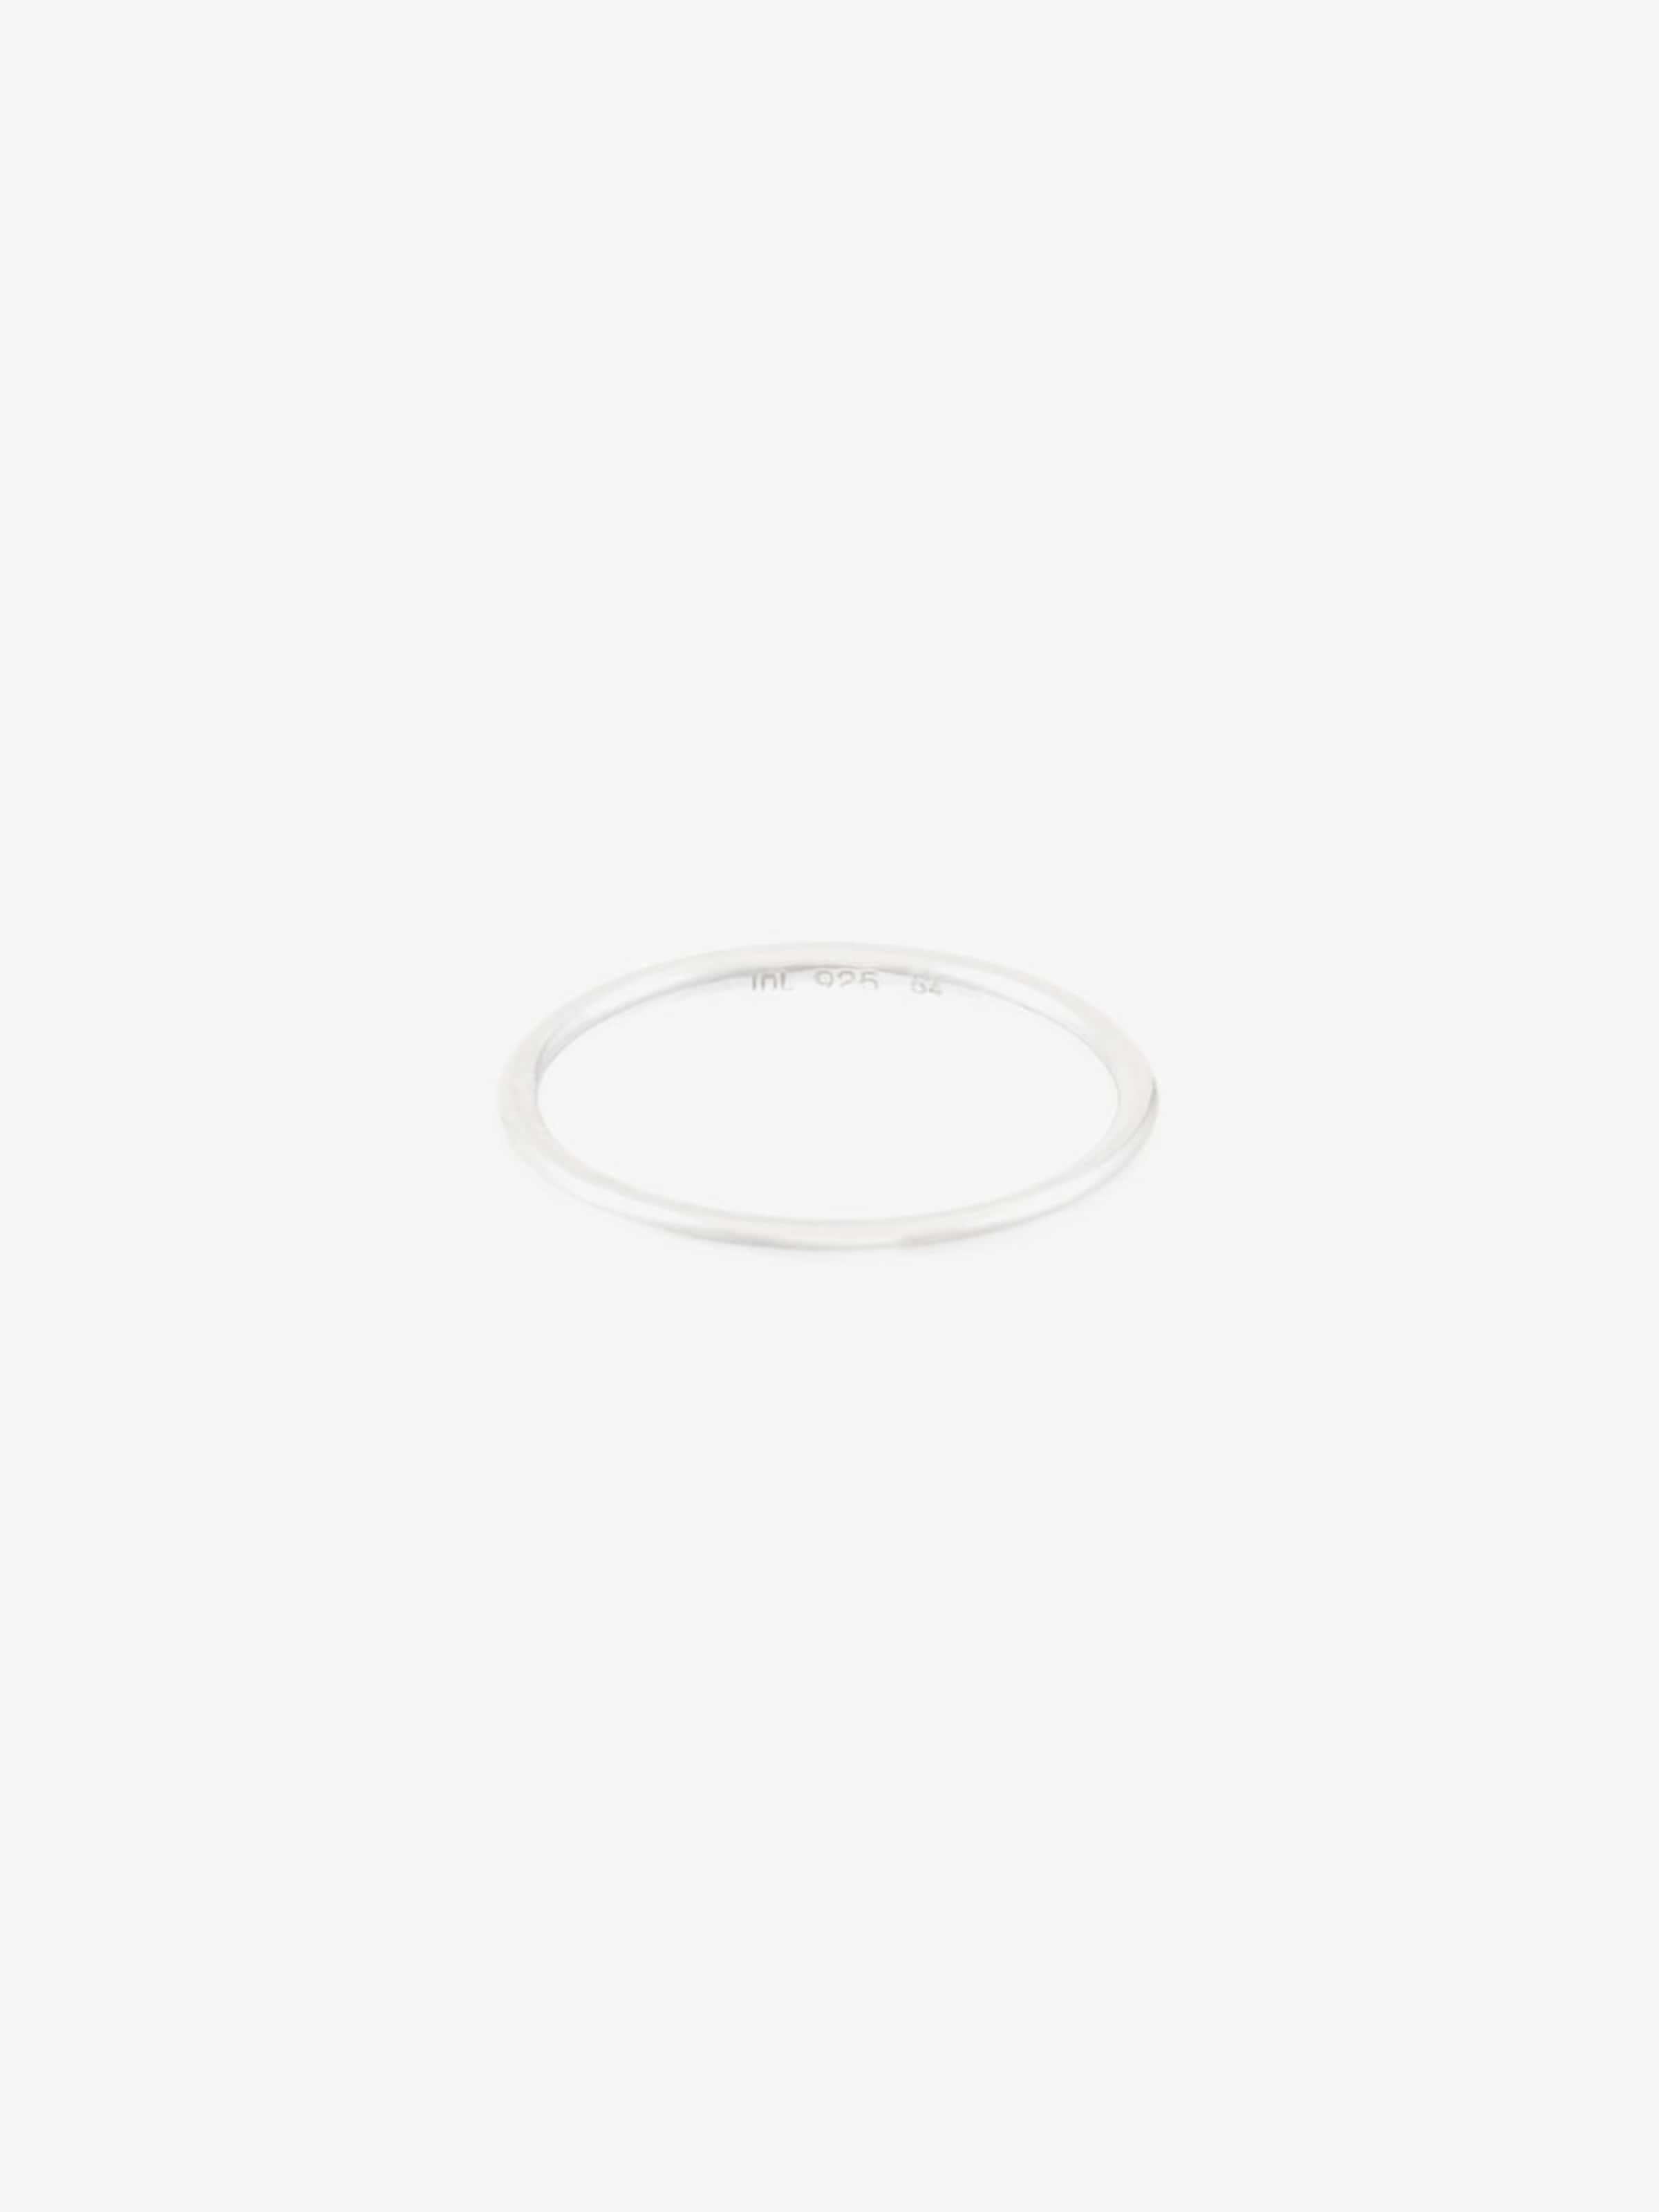 ID Fine Dash Ring Billig Verkauf Heißen Verkauf KJQljEbGcx